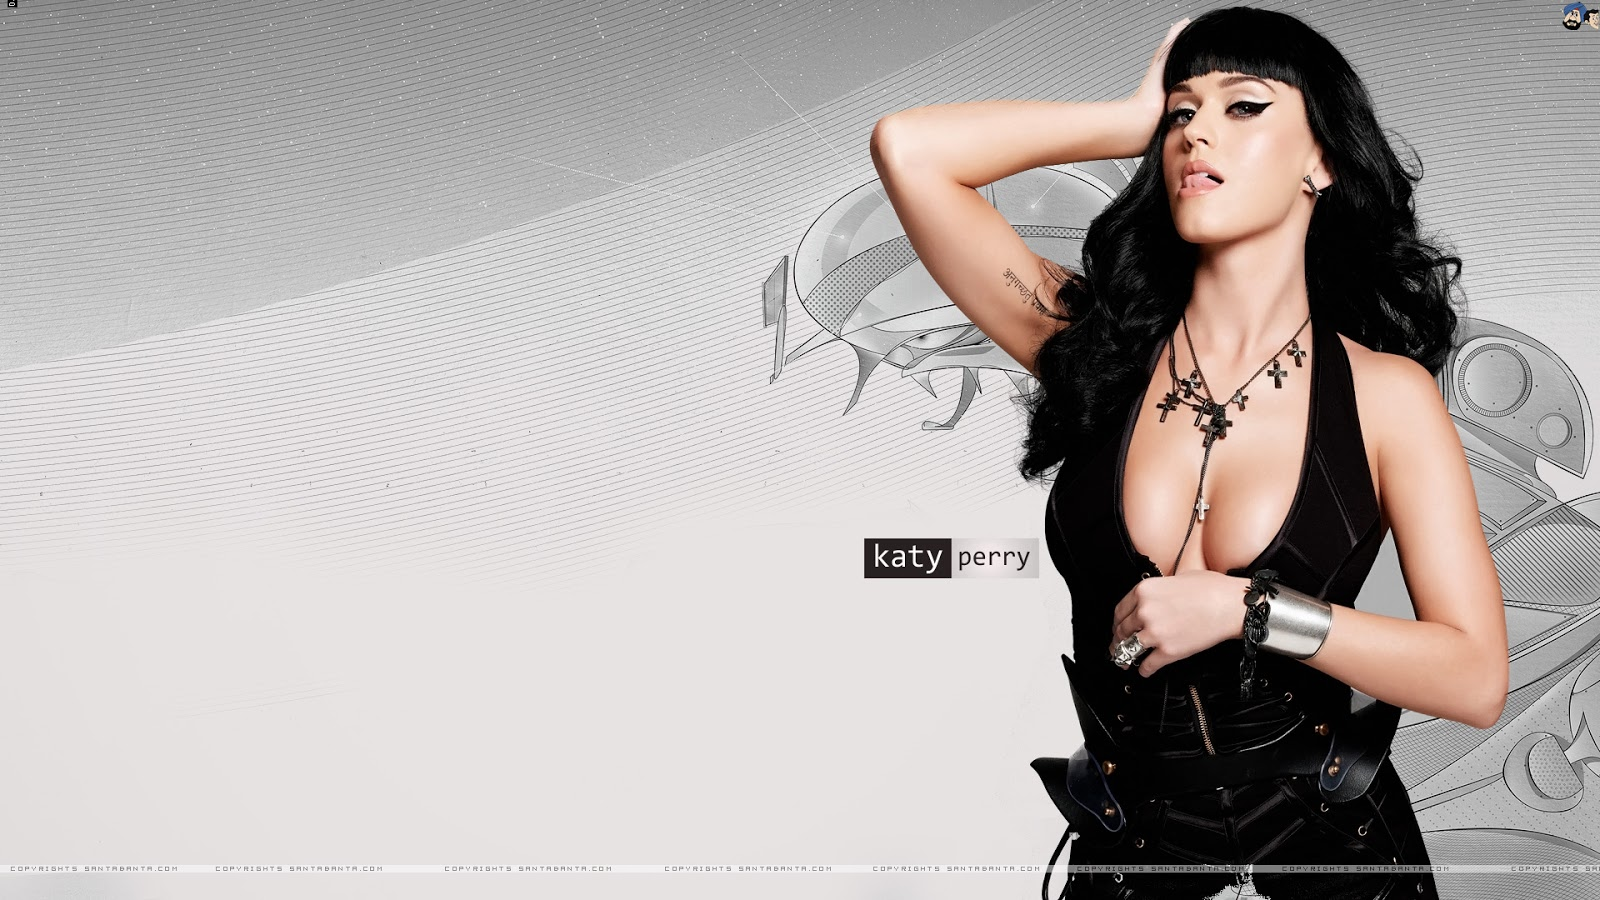 http://1.bp.blogspot.com/-oNBMFyEluXs/T0kFBTslnbI/AAAAAAAAD4A/9yNg1wKEbhw/s1600/katy+perry+hd+wallpapers.jpg